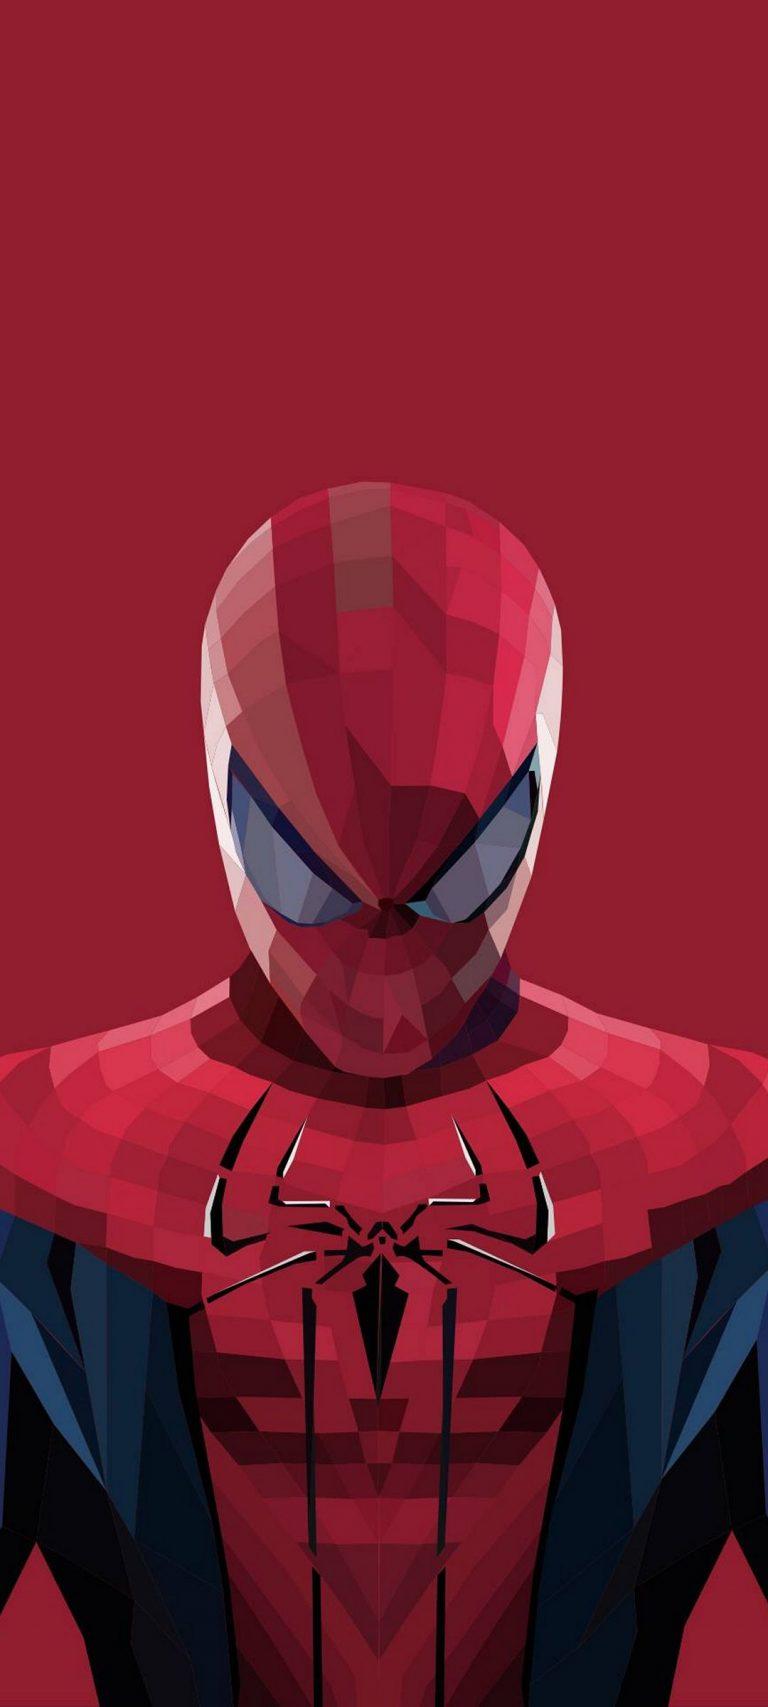 Superhero Spiderman Cartoon 1080x2400 768x1707